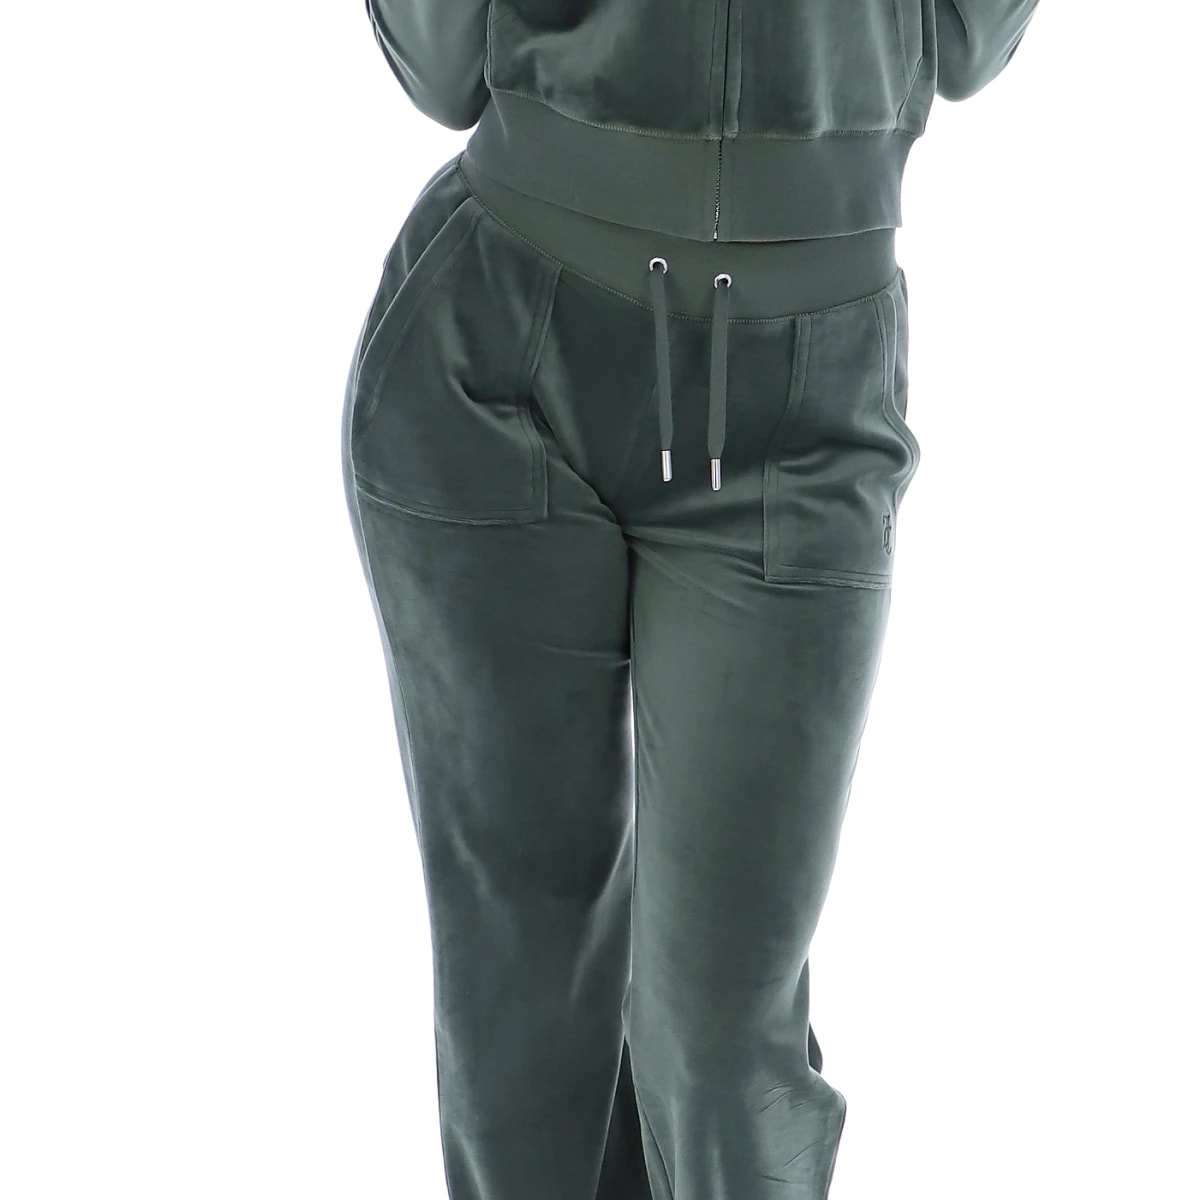 Juicy Couture - Bukse Del Ray Velour Dark Moss